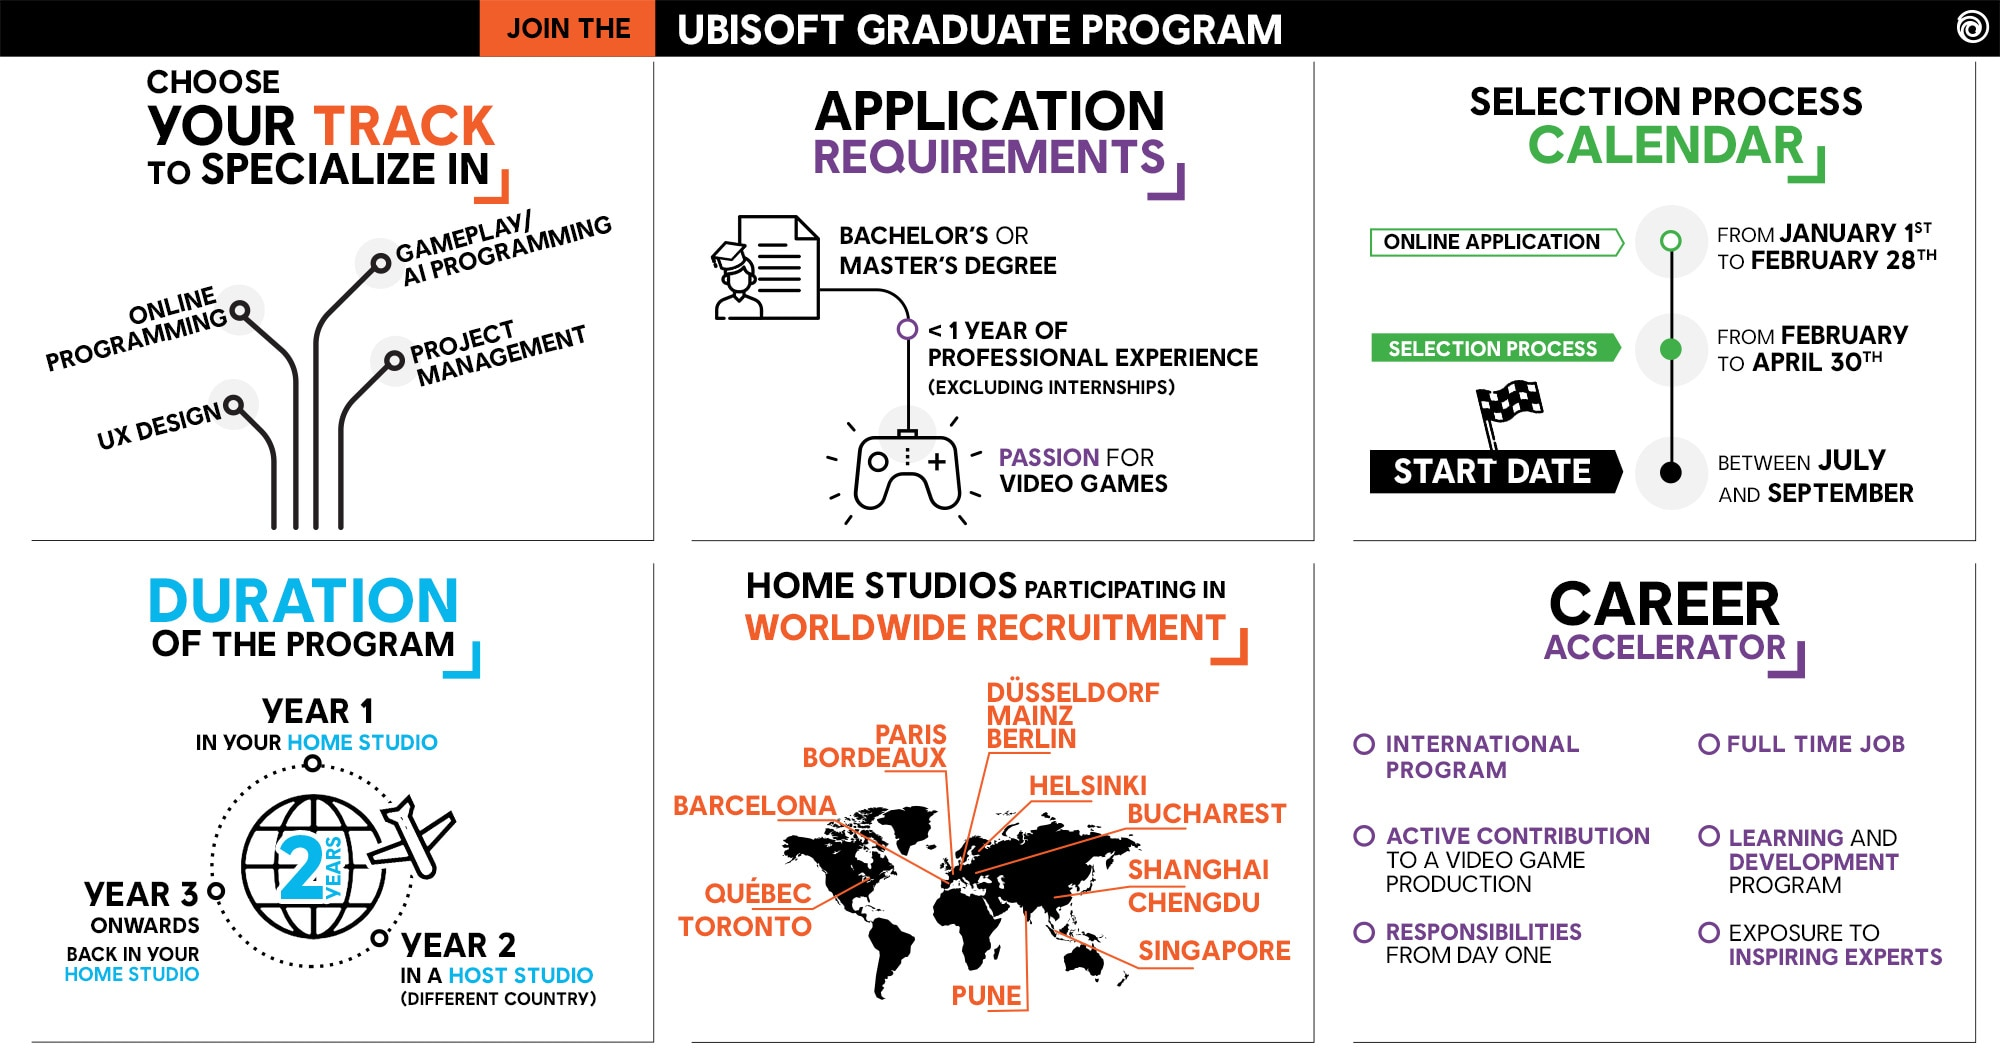 Ubisoft Graduate Program: Essential Tips from Current Ubigrads - Image 6